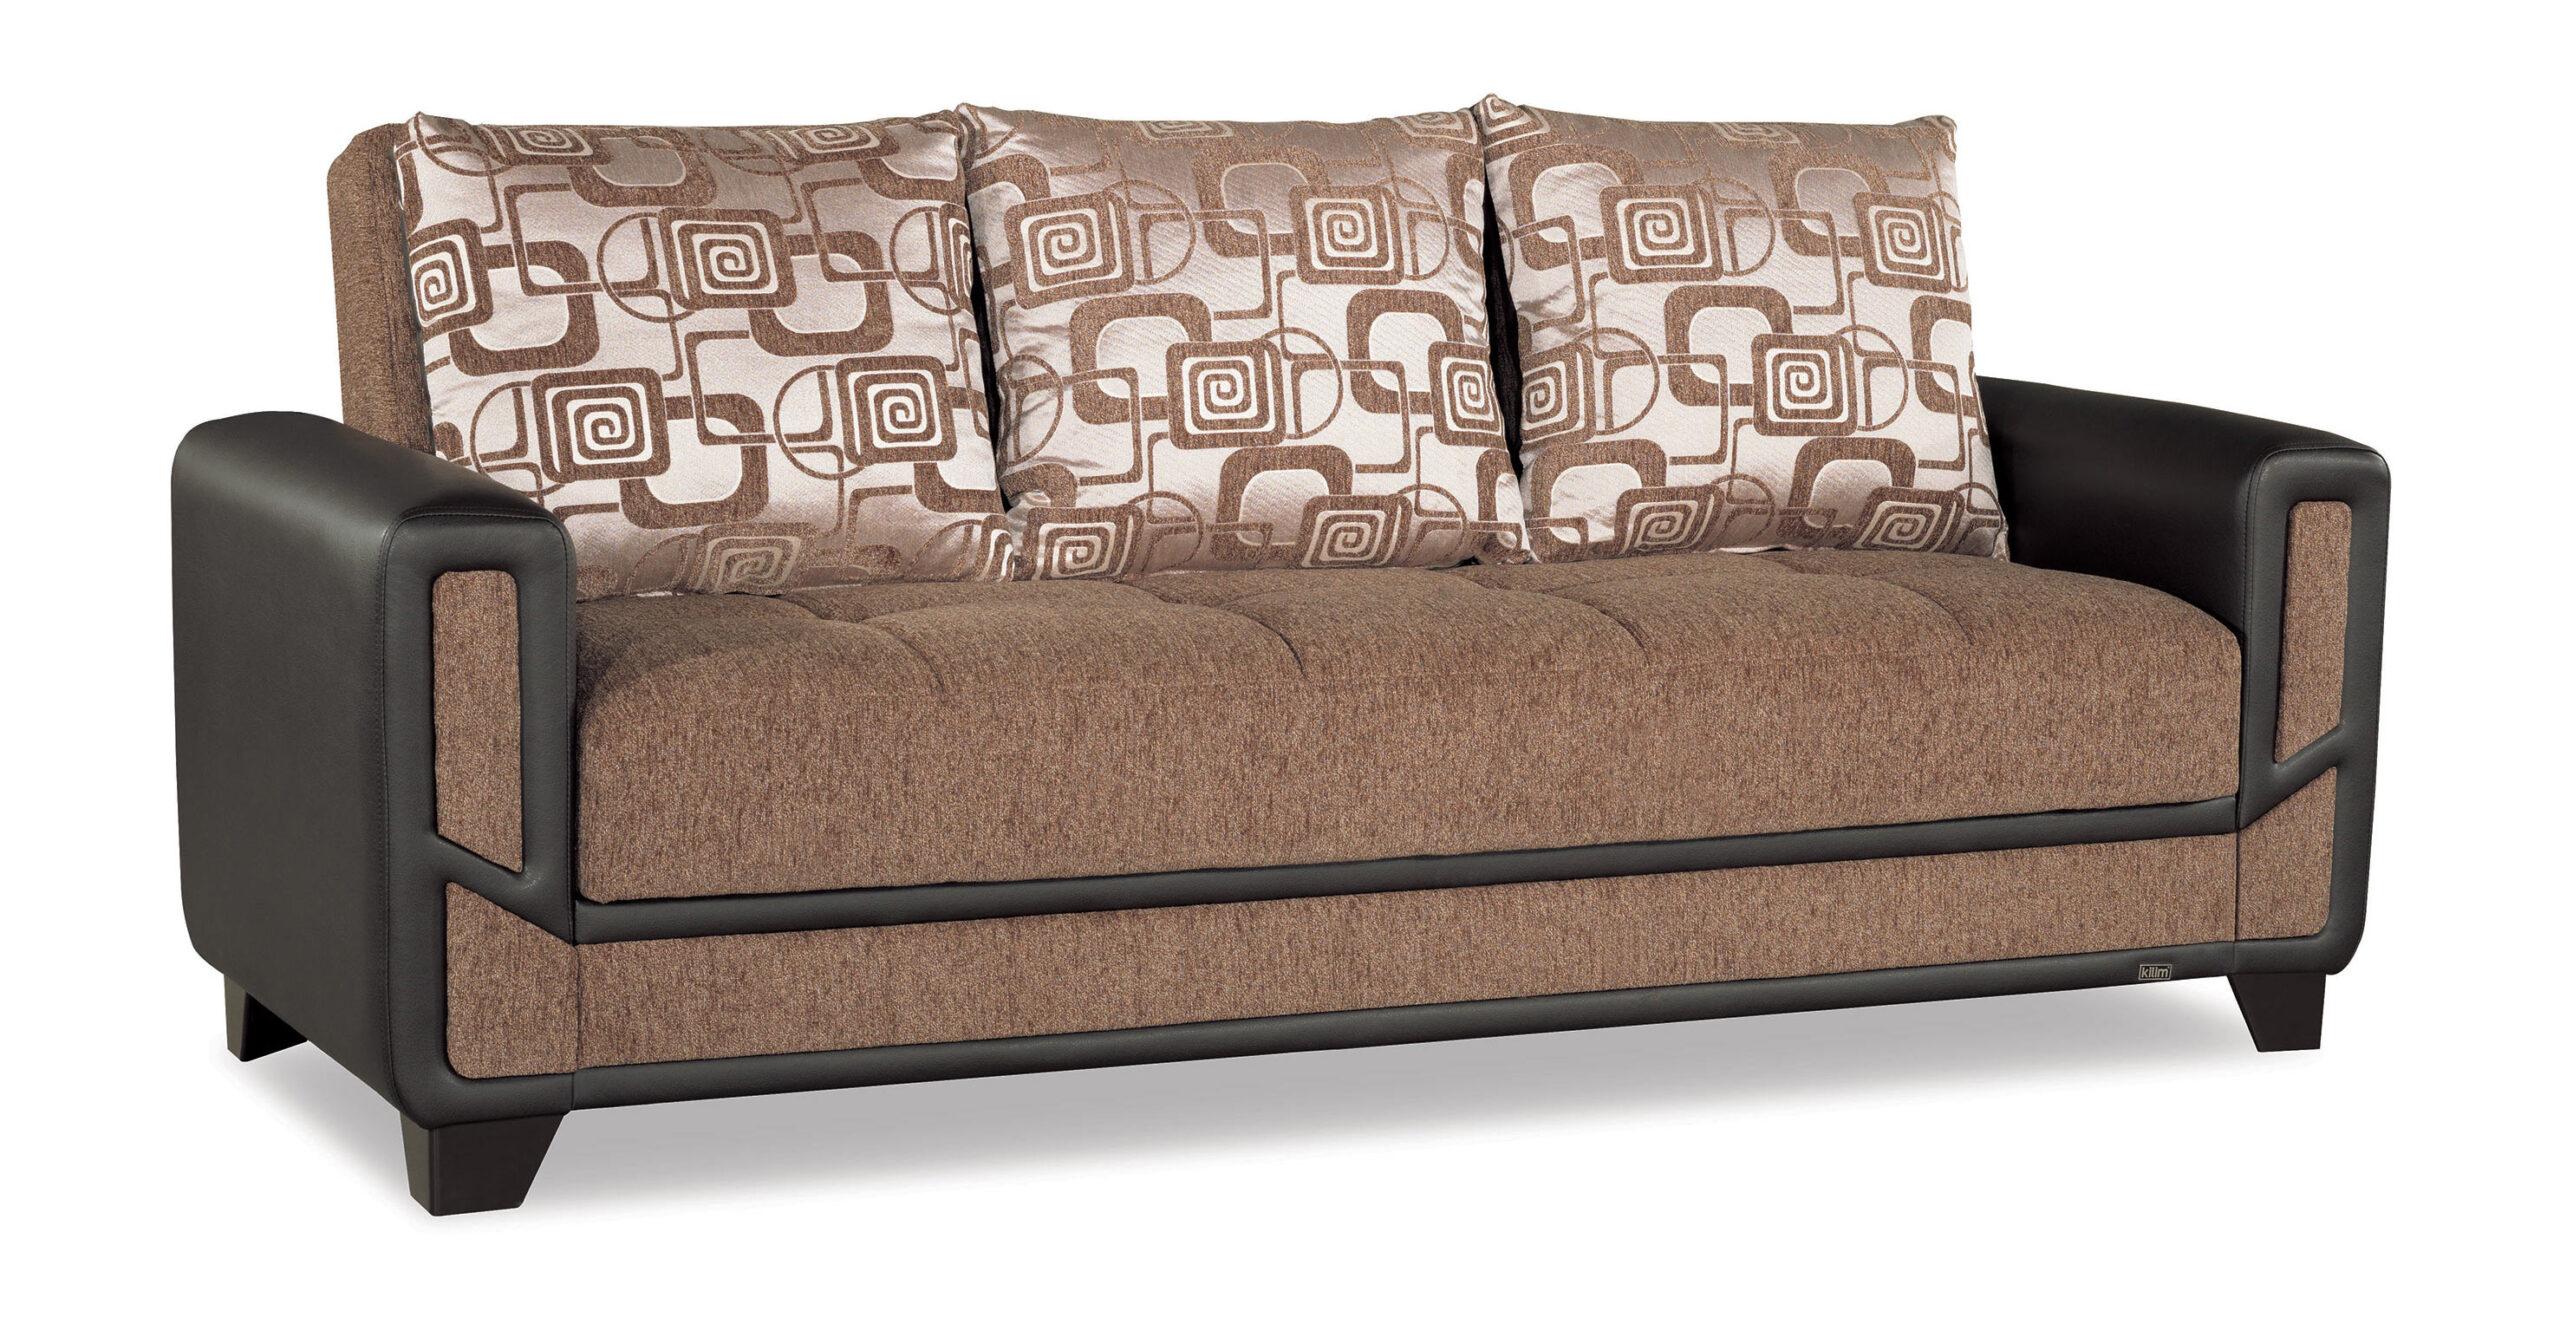 Full Size of Mondo Sofa Couch Leder Srl Bertinoro Agata Meble 3 Brick Kaufen Online Bed Group Capocolle 2 1 Orari Softline Erfahrungen Home Affaire Big Ewald Schillig Samt Sofa Mondo Sofa